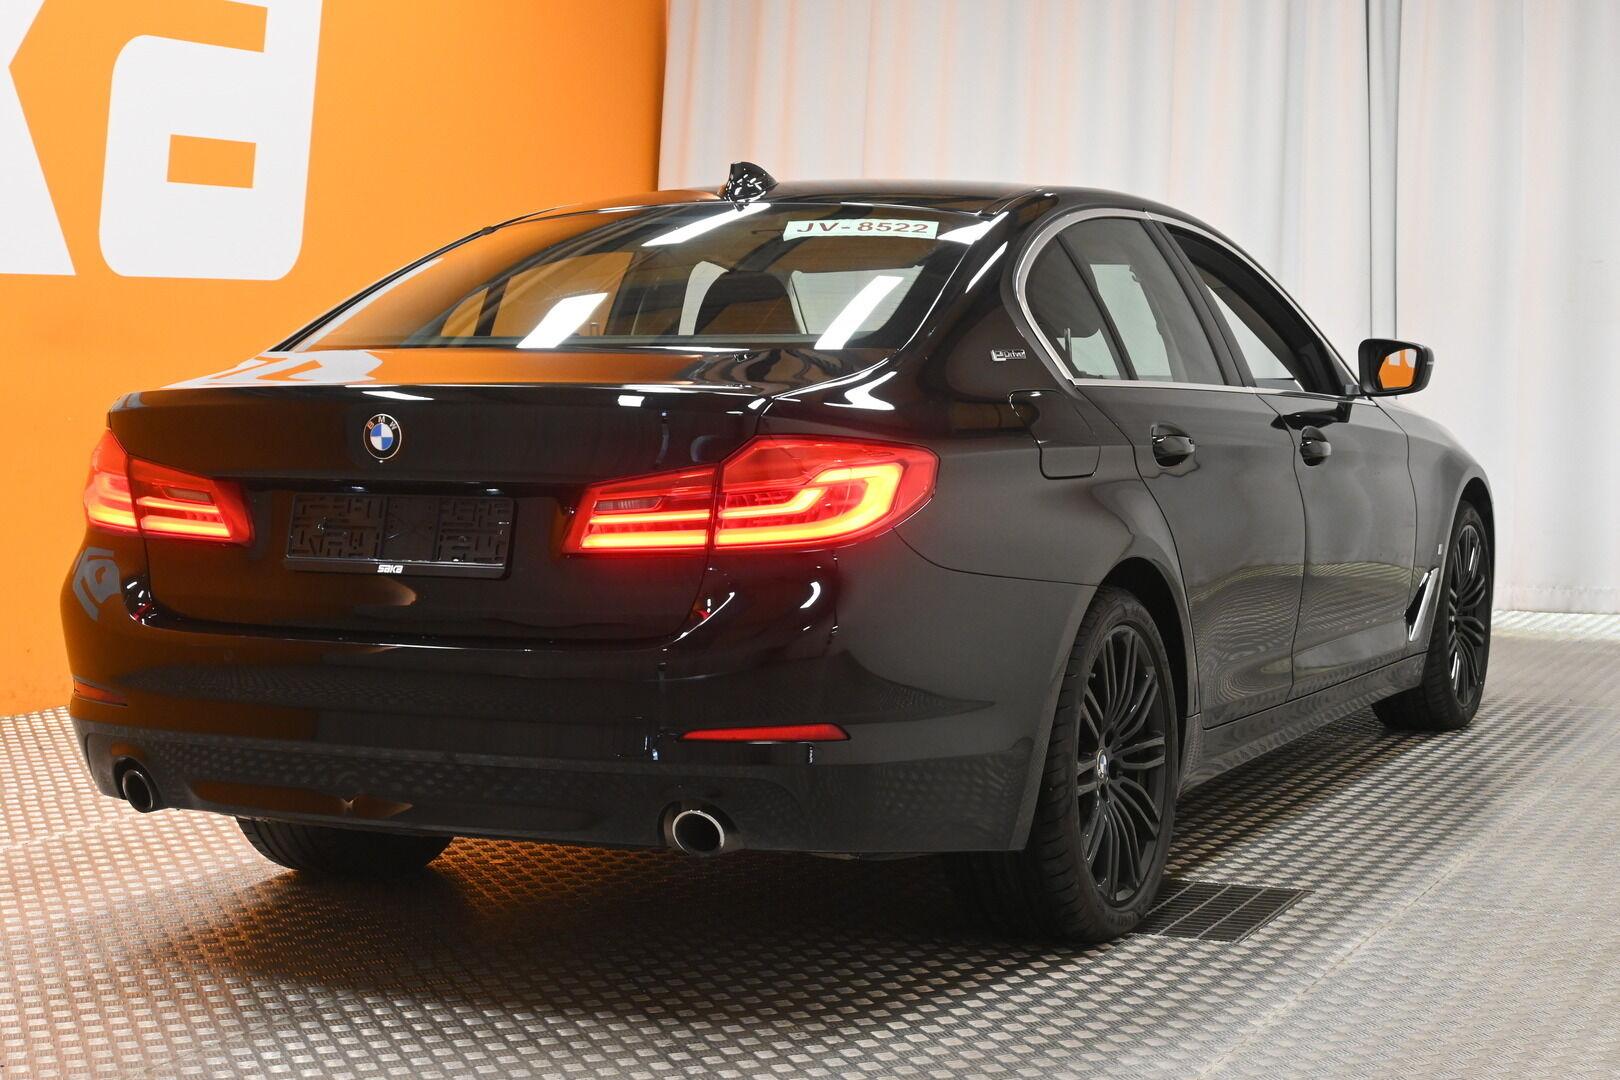 Musta Sedan, BMW 530 – KON-32251, kuva 6